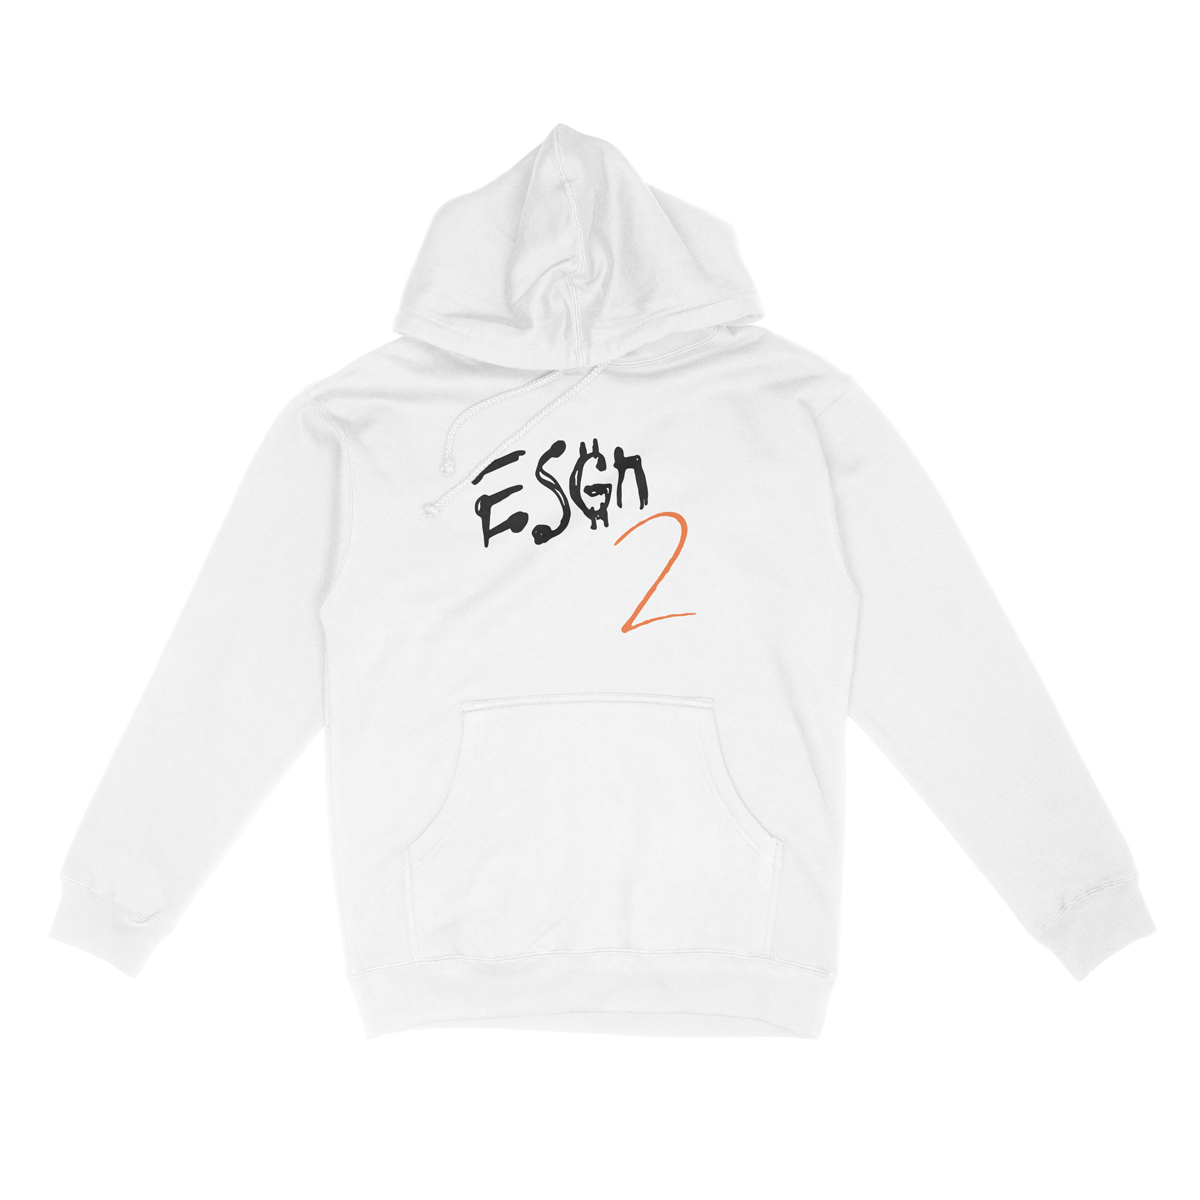 ESGN2 Hoodie - White